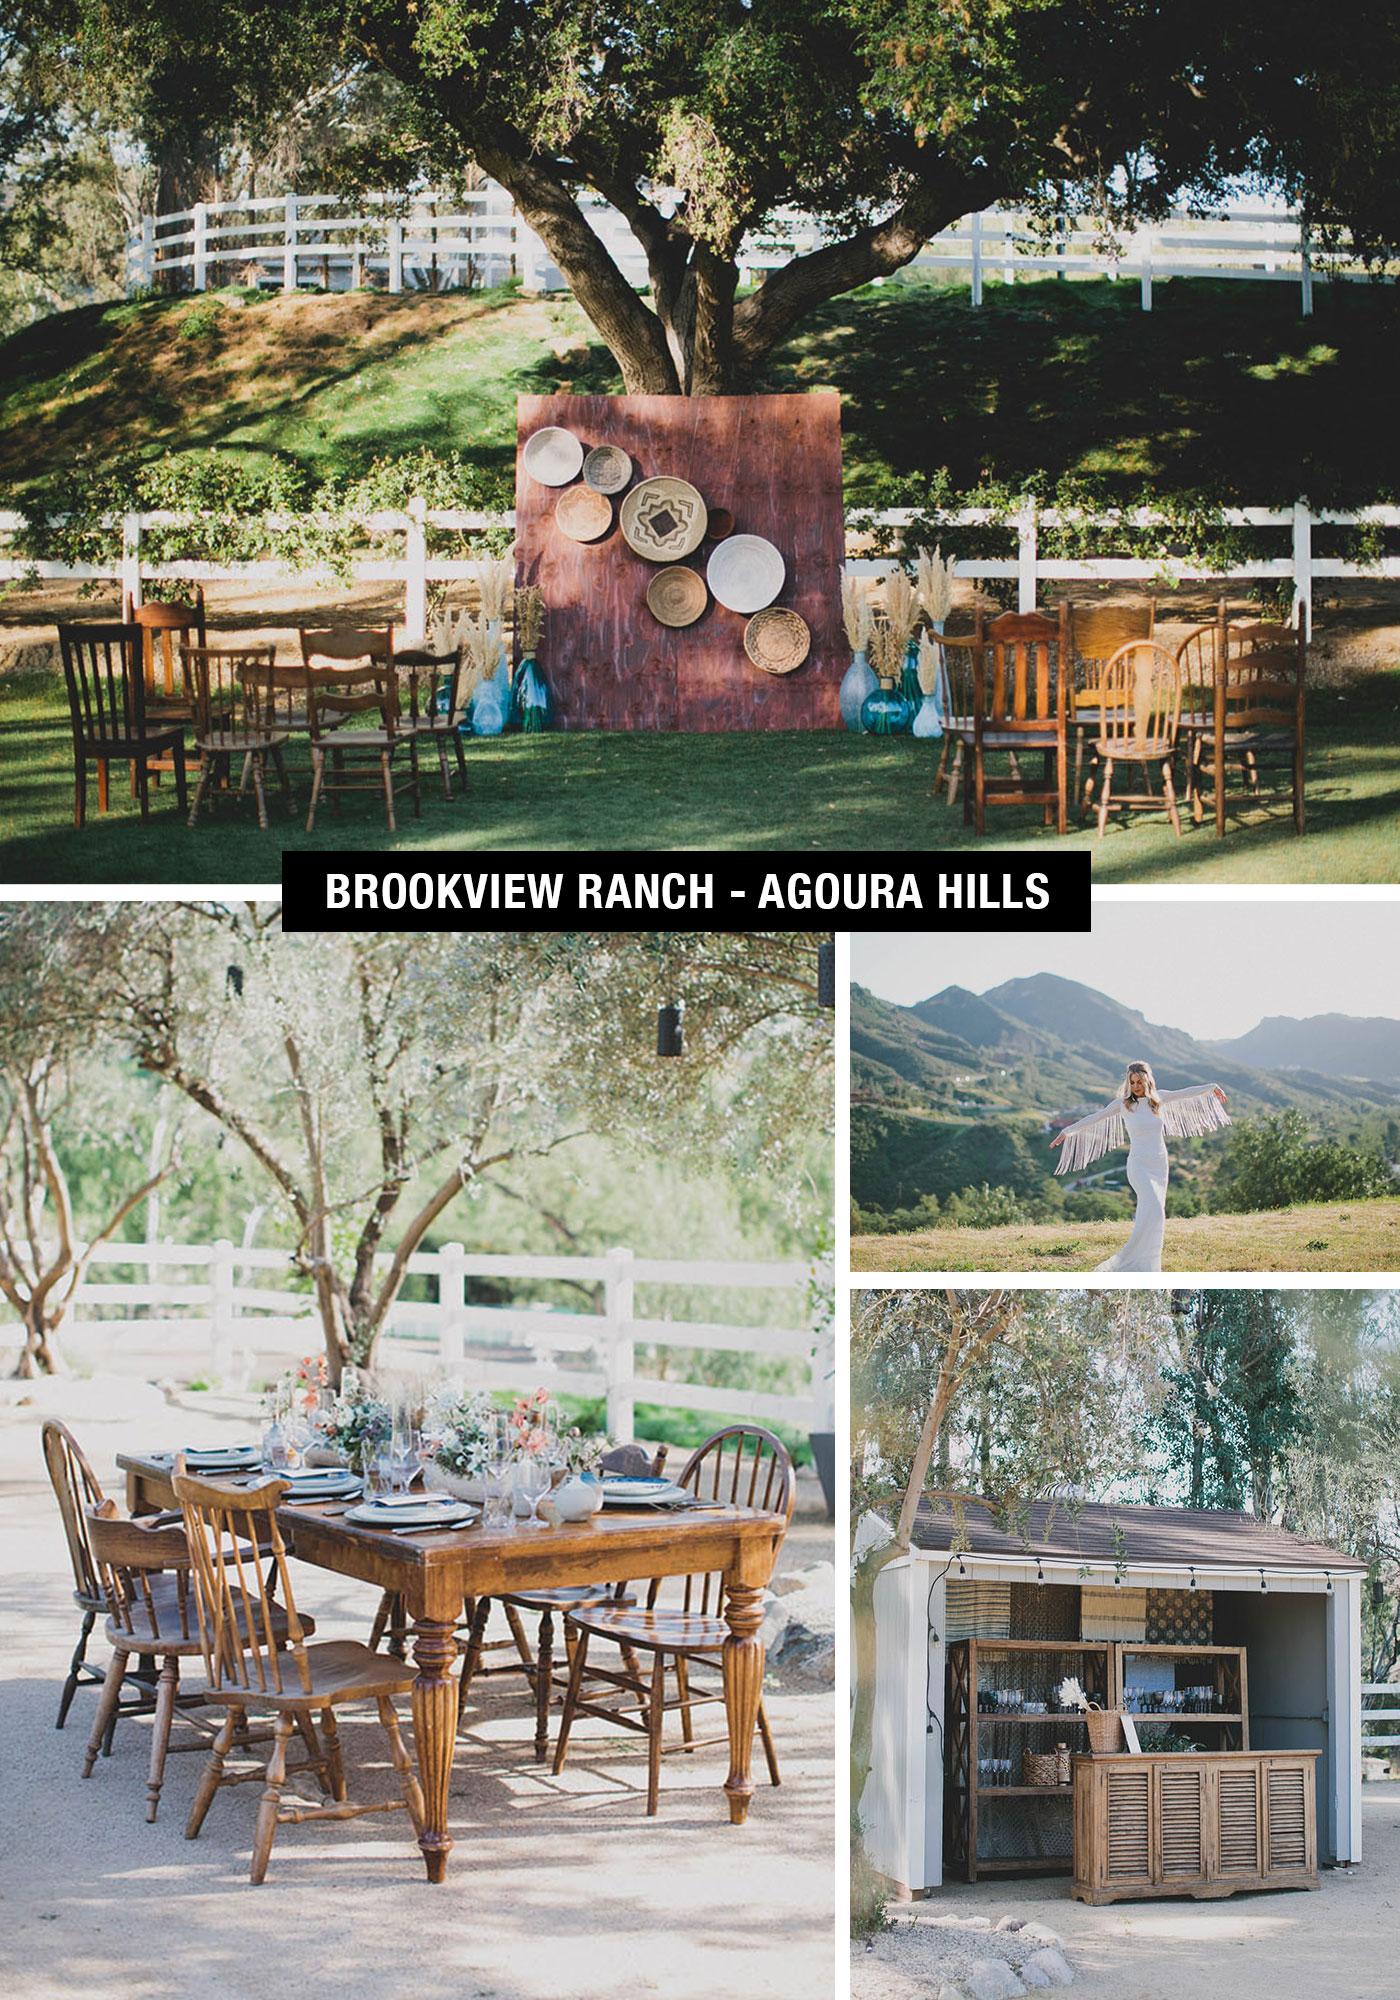 Brookview Ranch Agora Hills